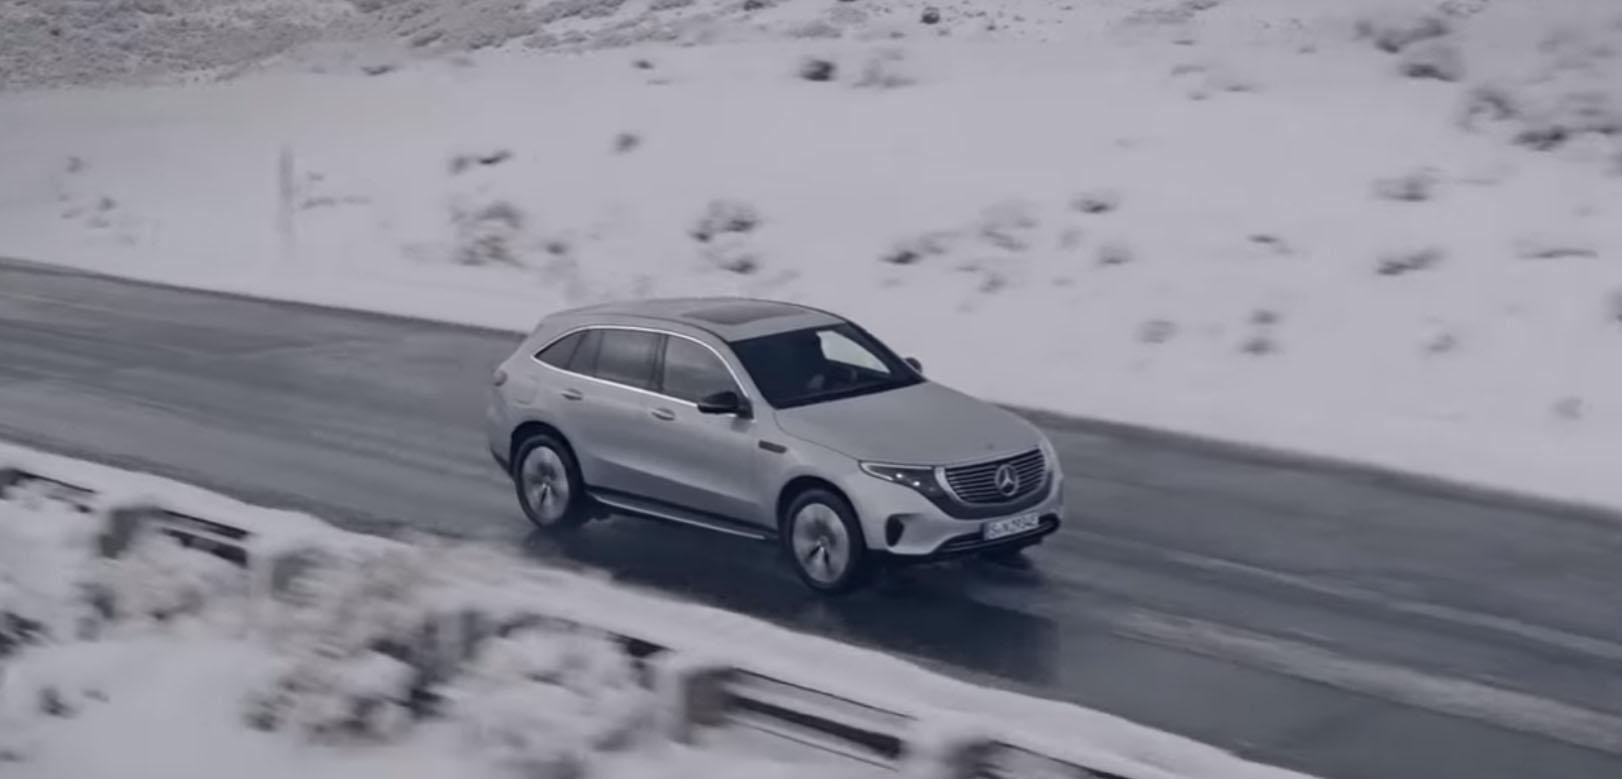 Commercial Shoot Detailing for Mercedes-Benz EQ